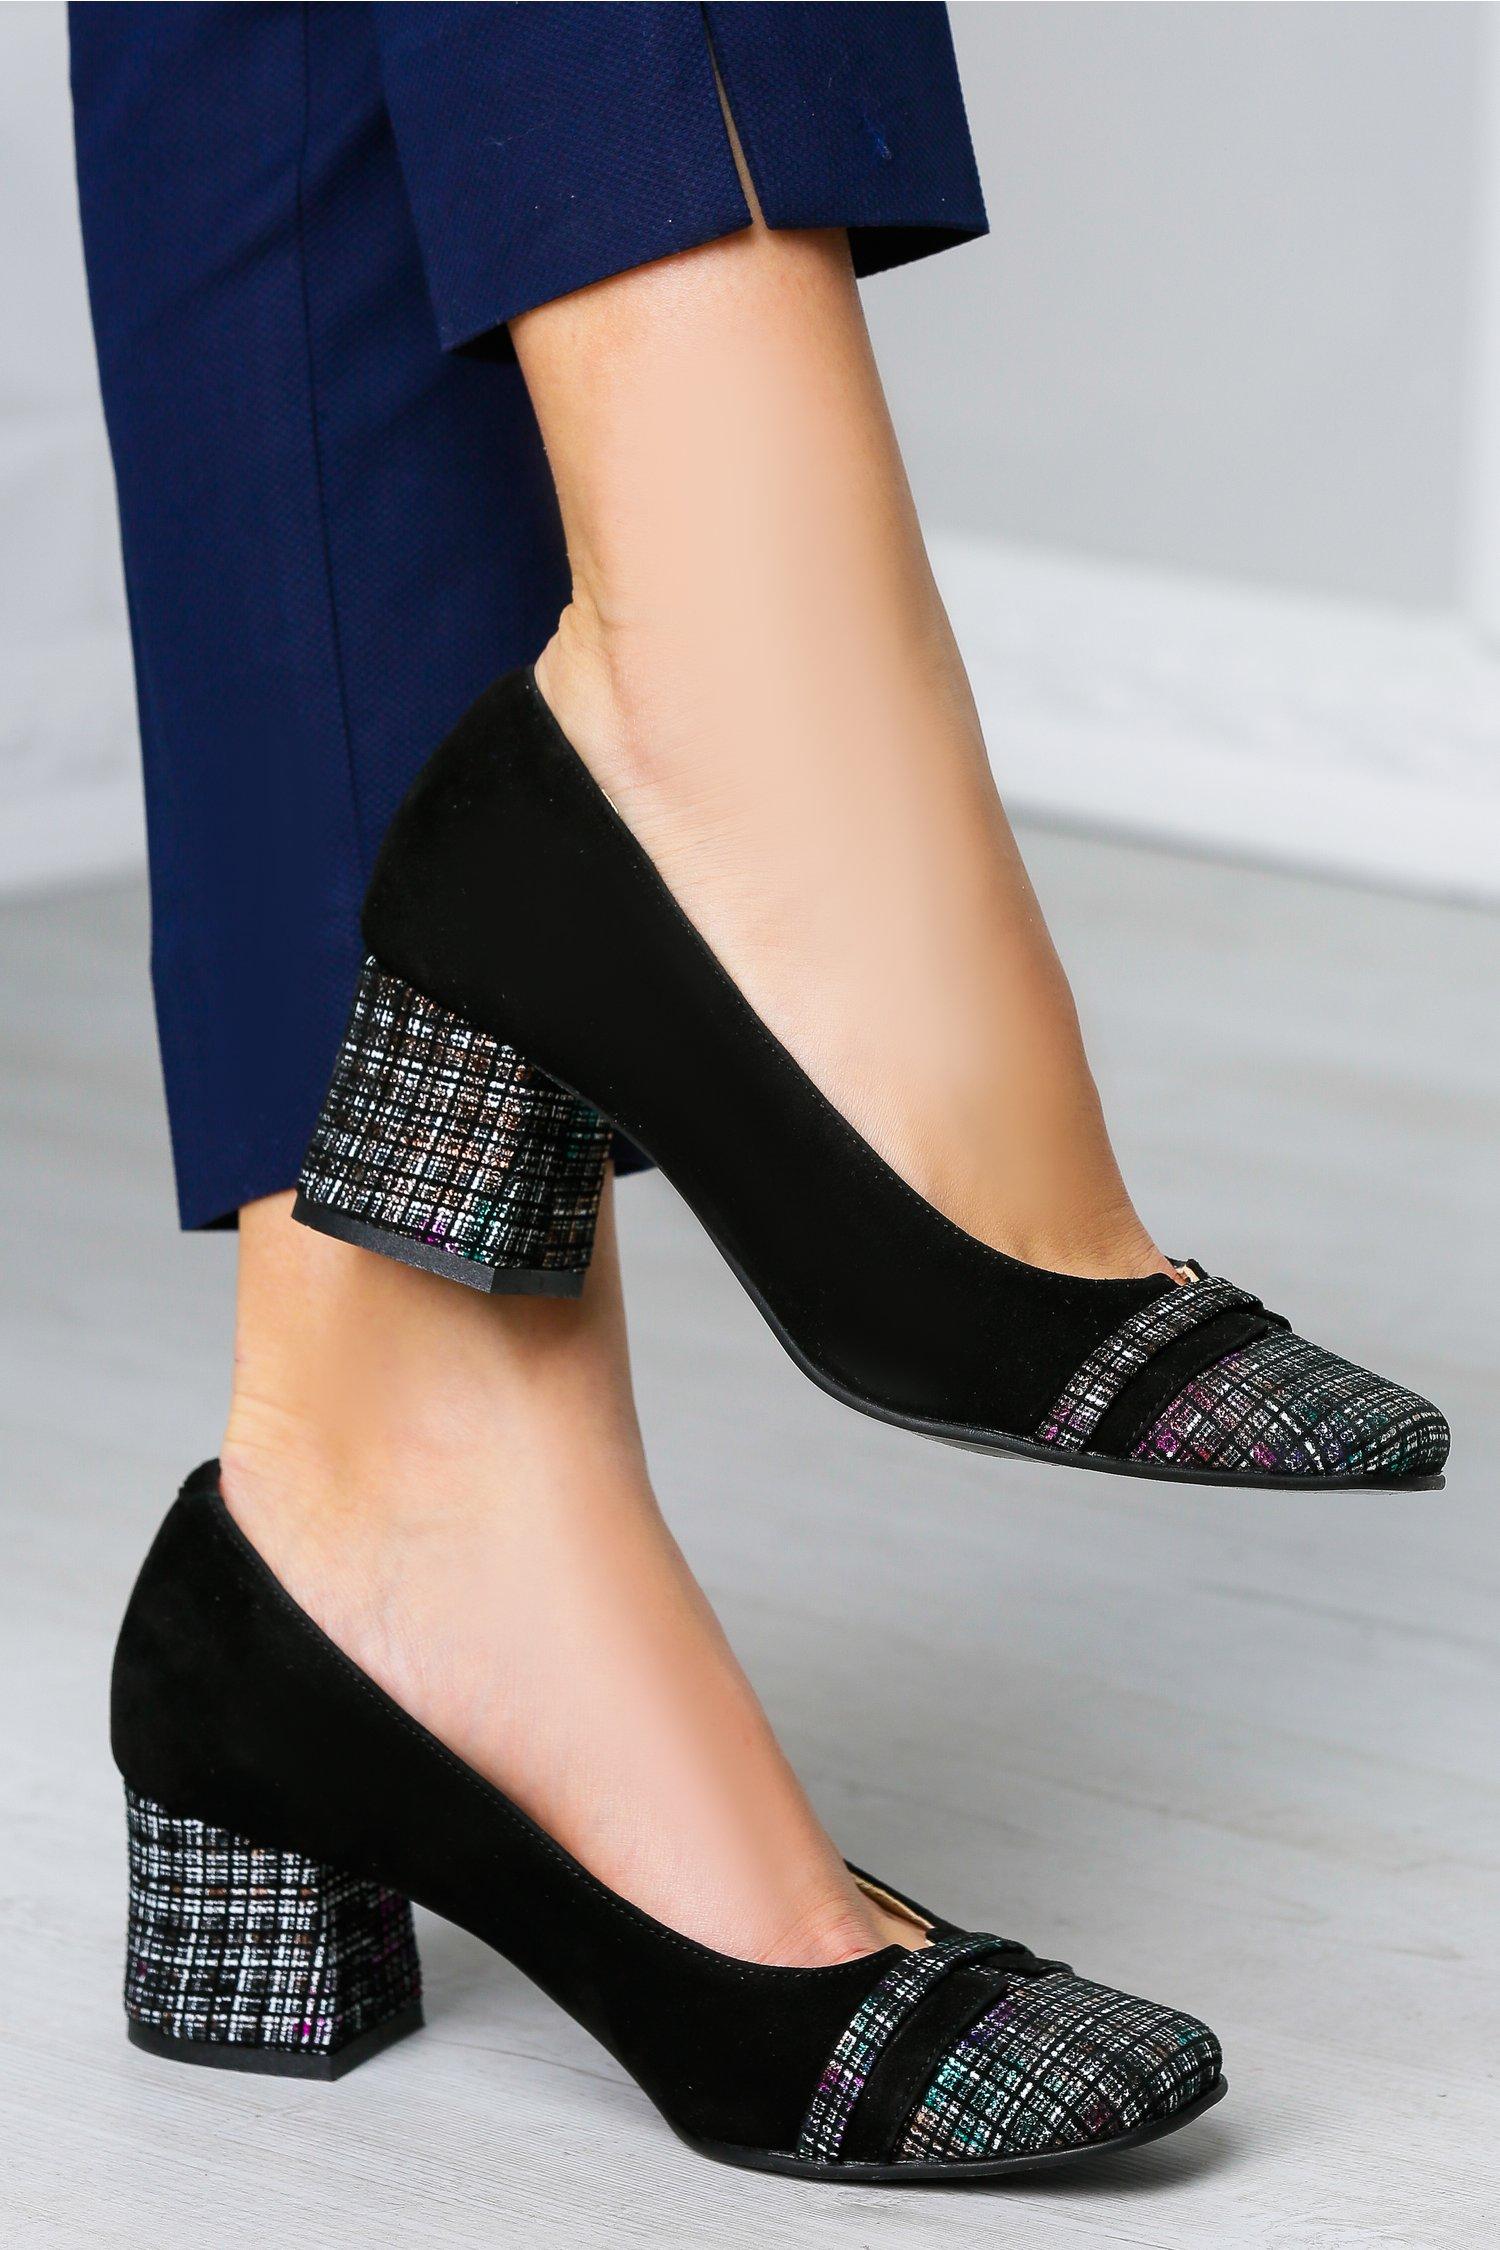 Pantofi Natasa negri cu toc jos imprimat, colectia 2018